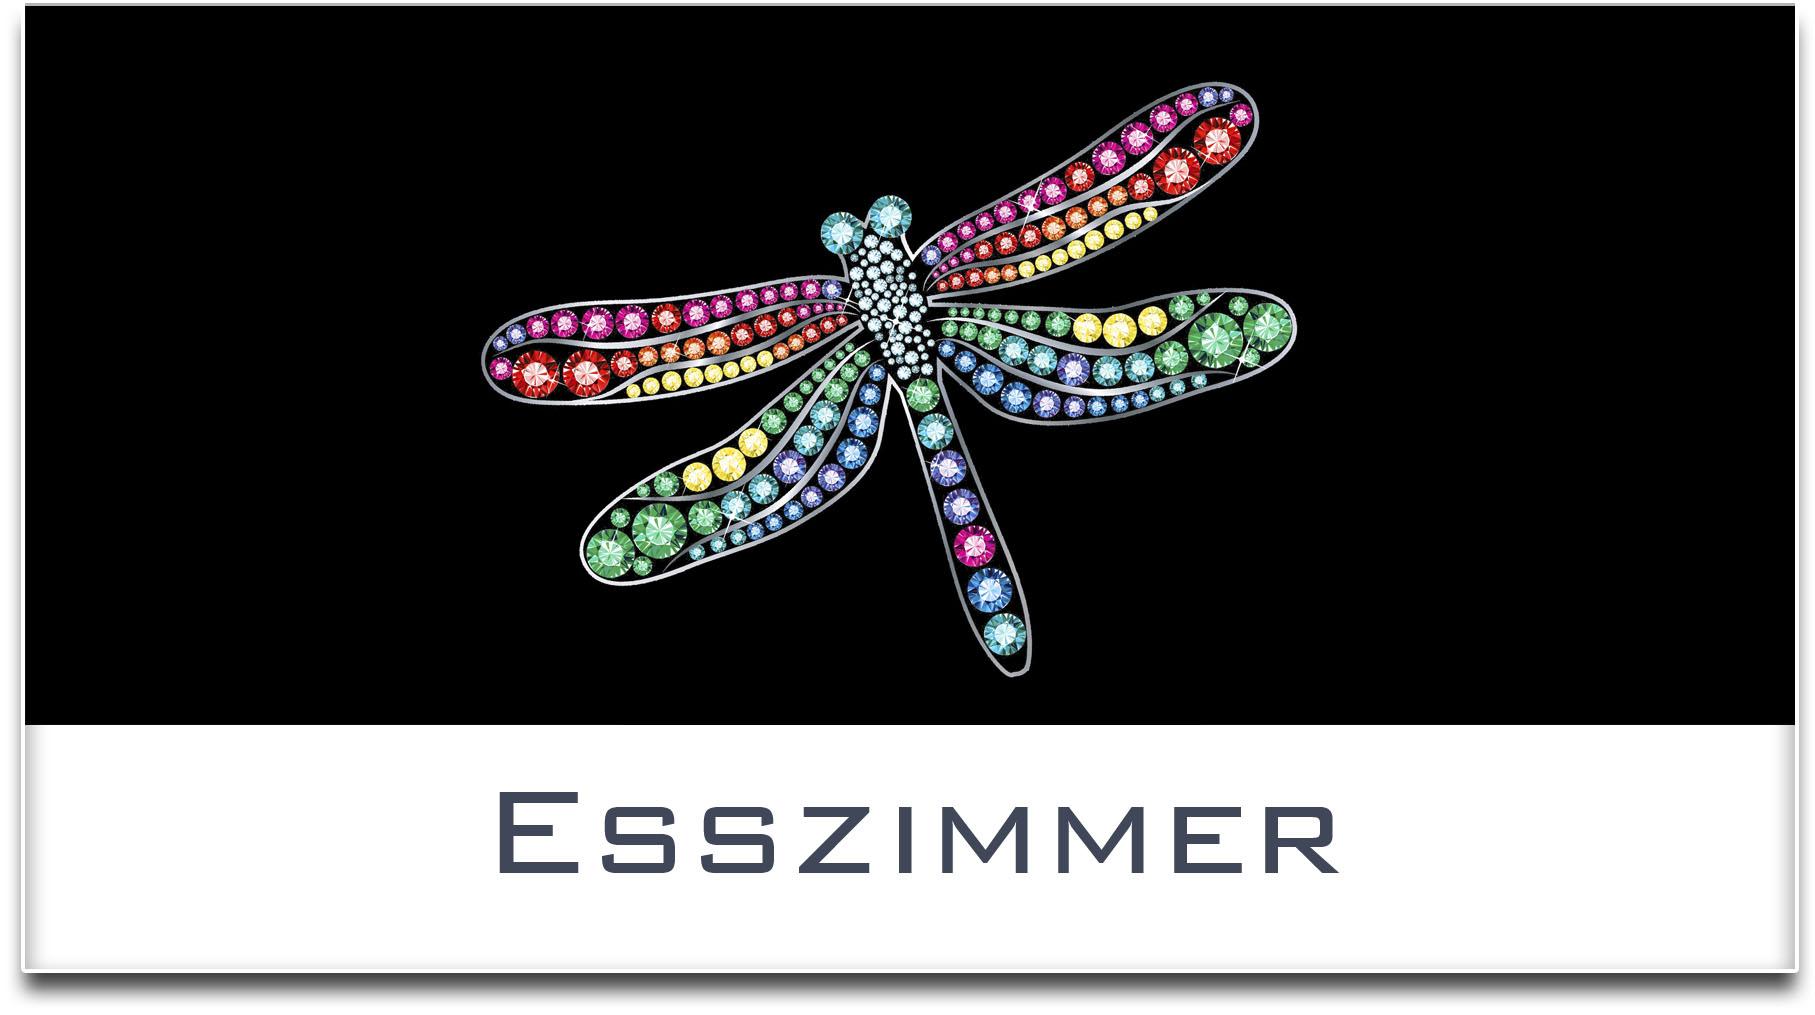 Türschild / Haustürschild / Libelle / Esszimmer / Selbstklebend